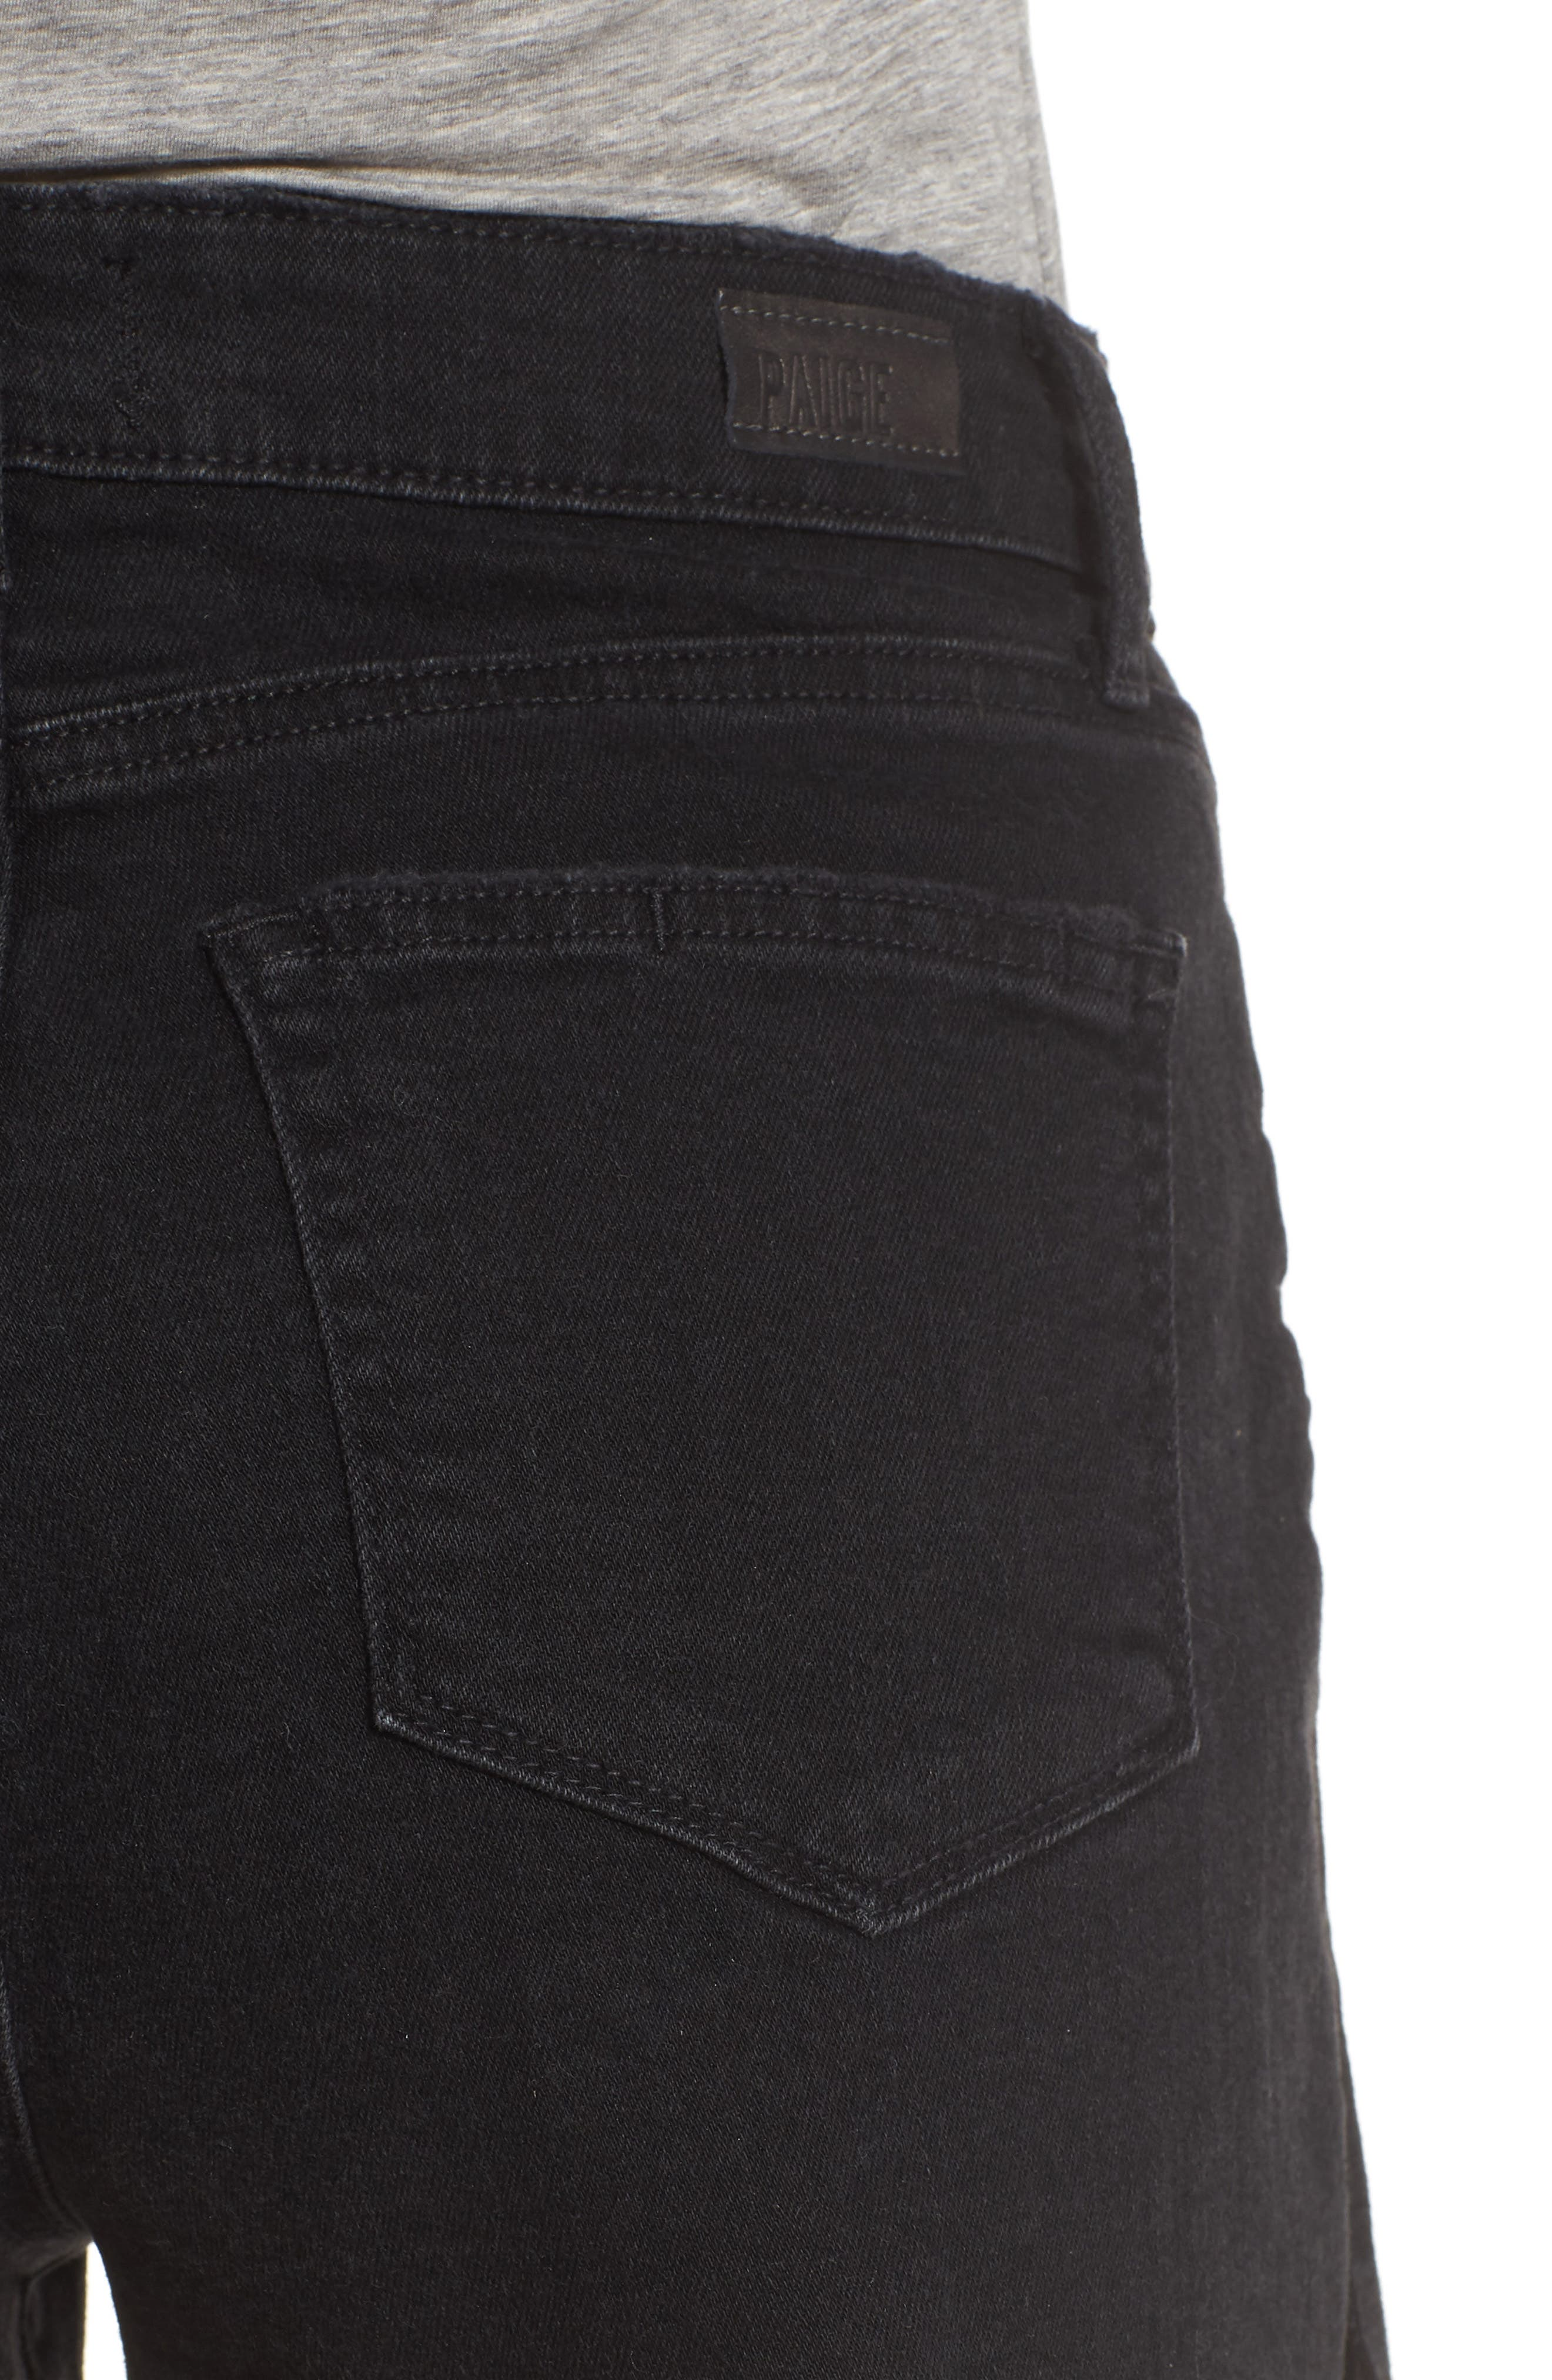 'Margot' High Rise Cutoff Denim Shorts,                             Alternate thumbnail 5, color,